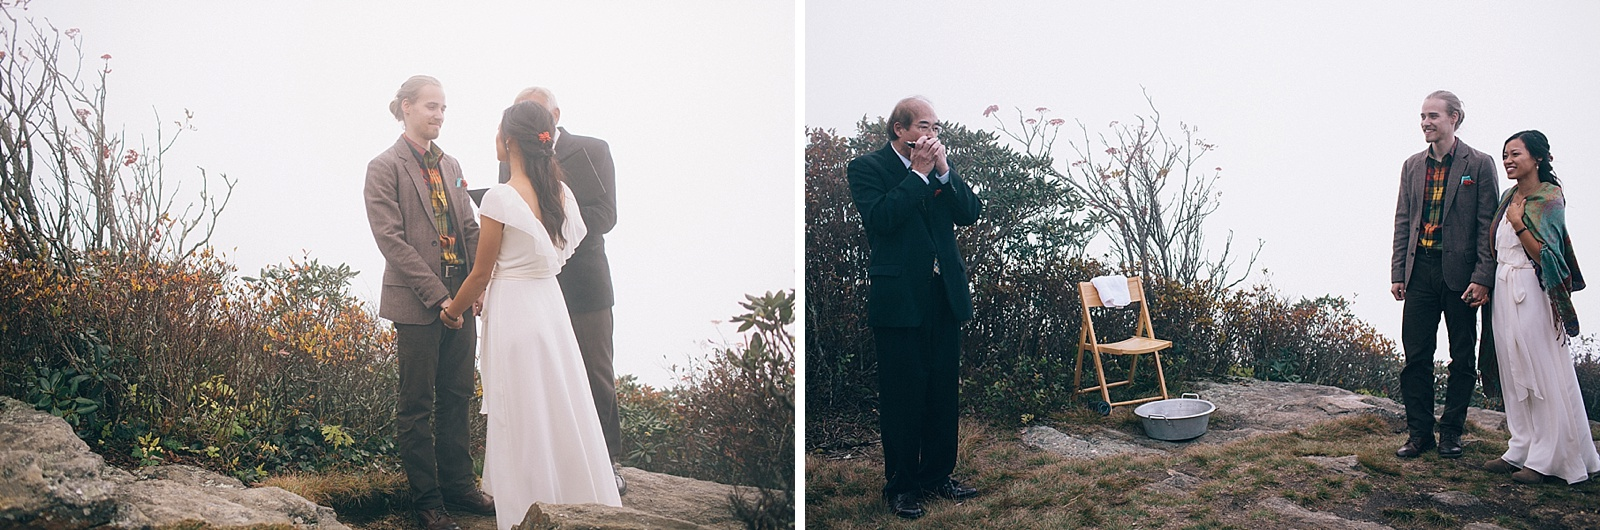 diana-elizabeth-blog-travel-fashion-blogger-north-carolina-wedding-elopement-craggy-pinnacle-trail_0008